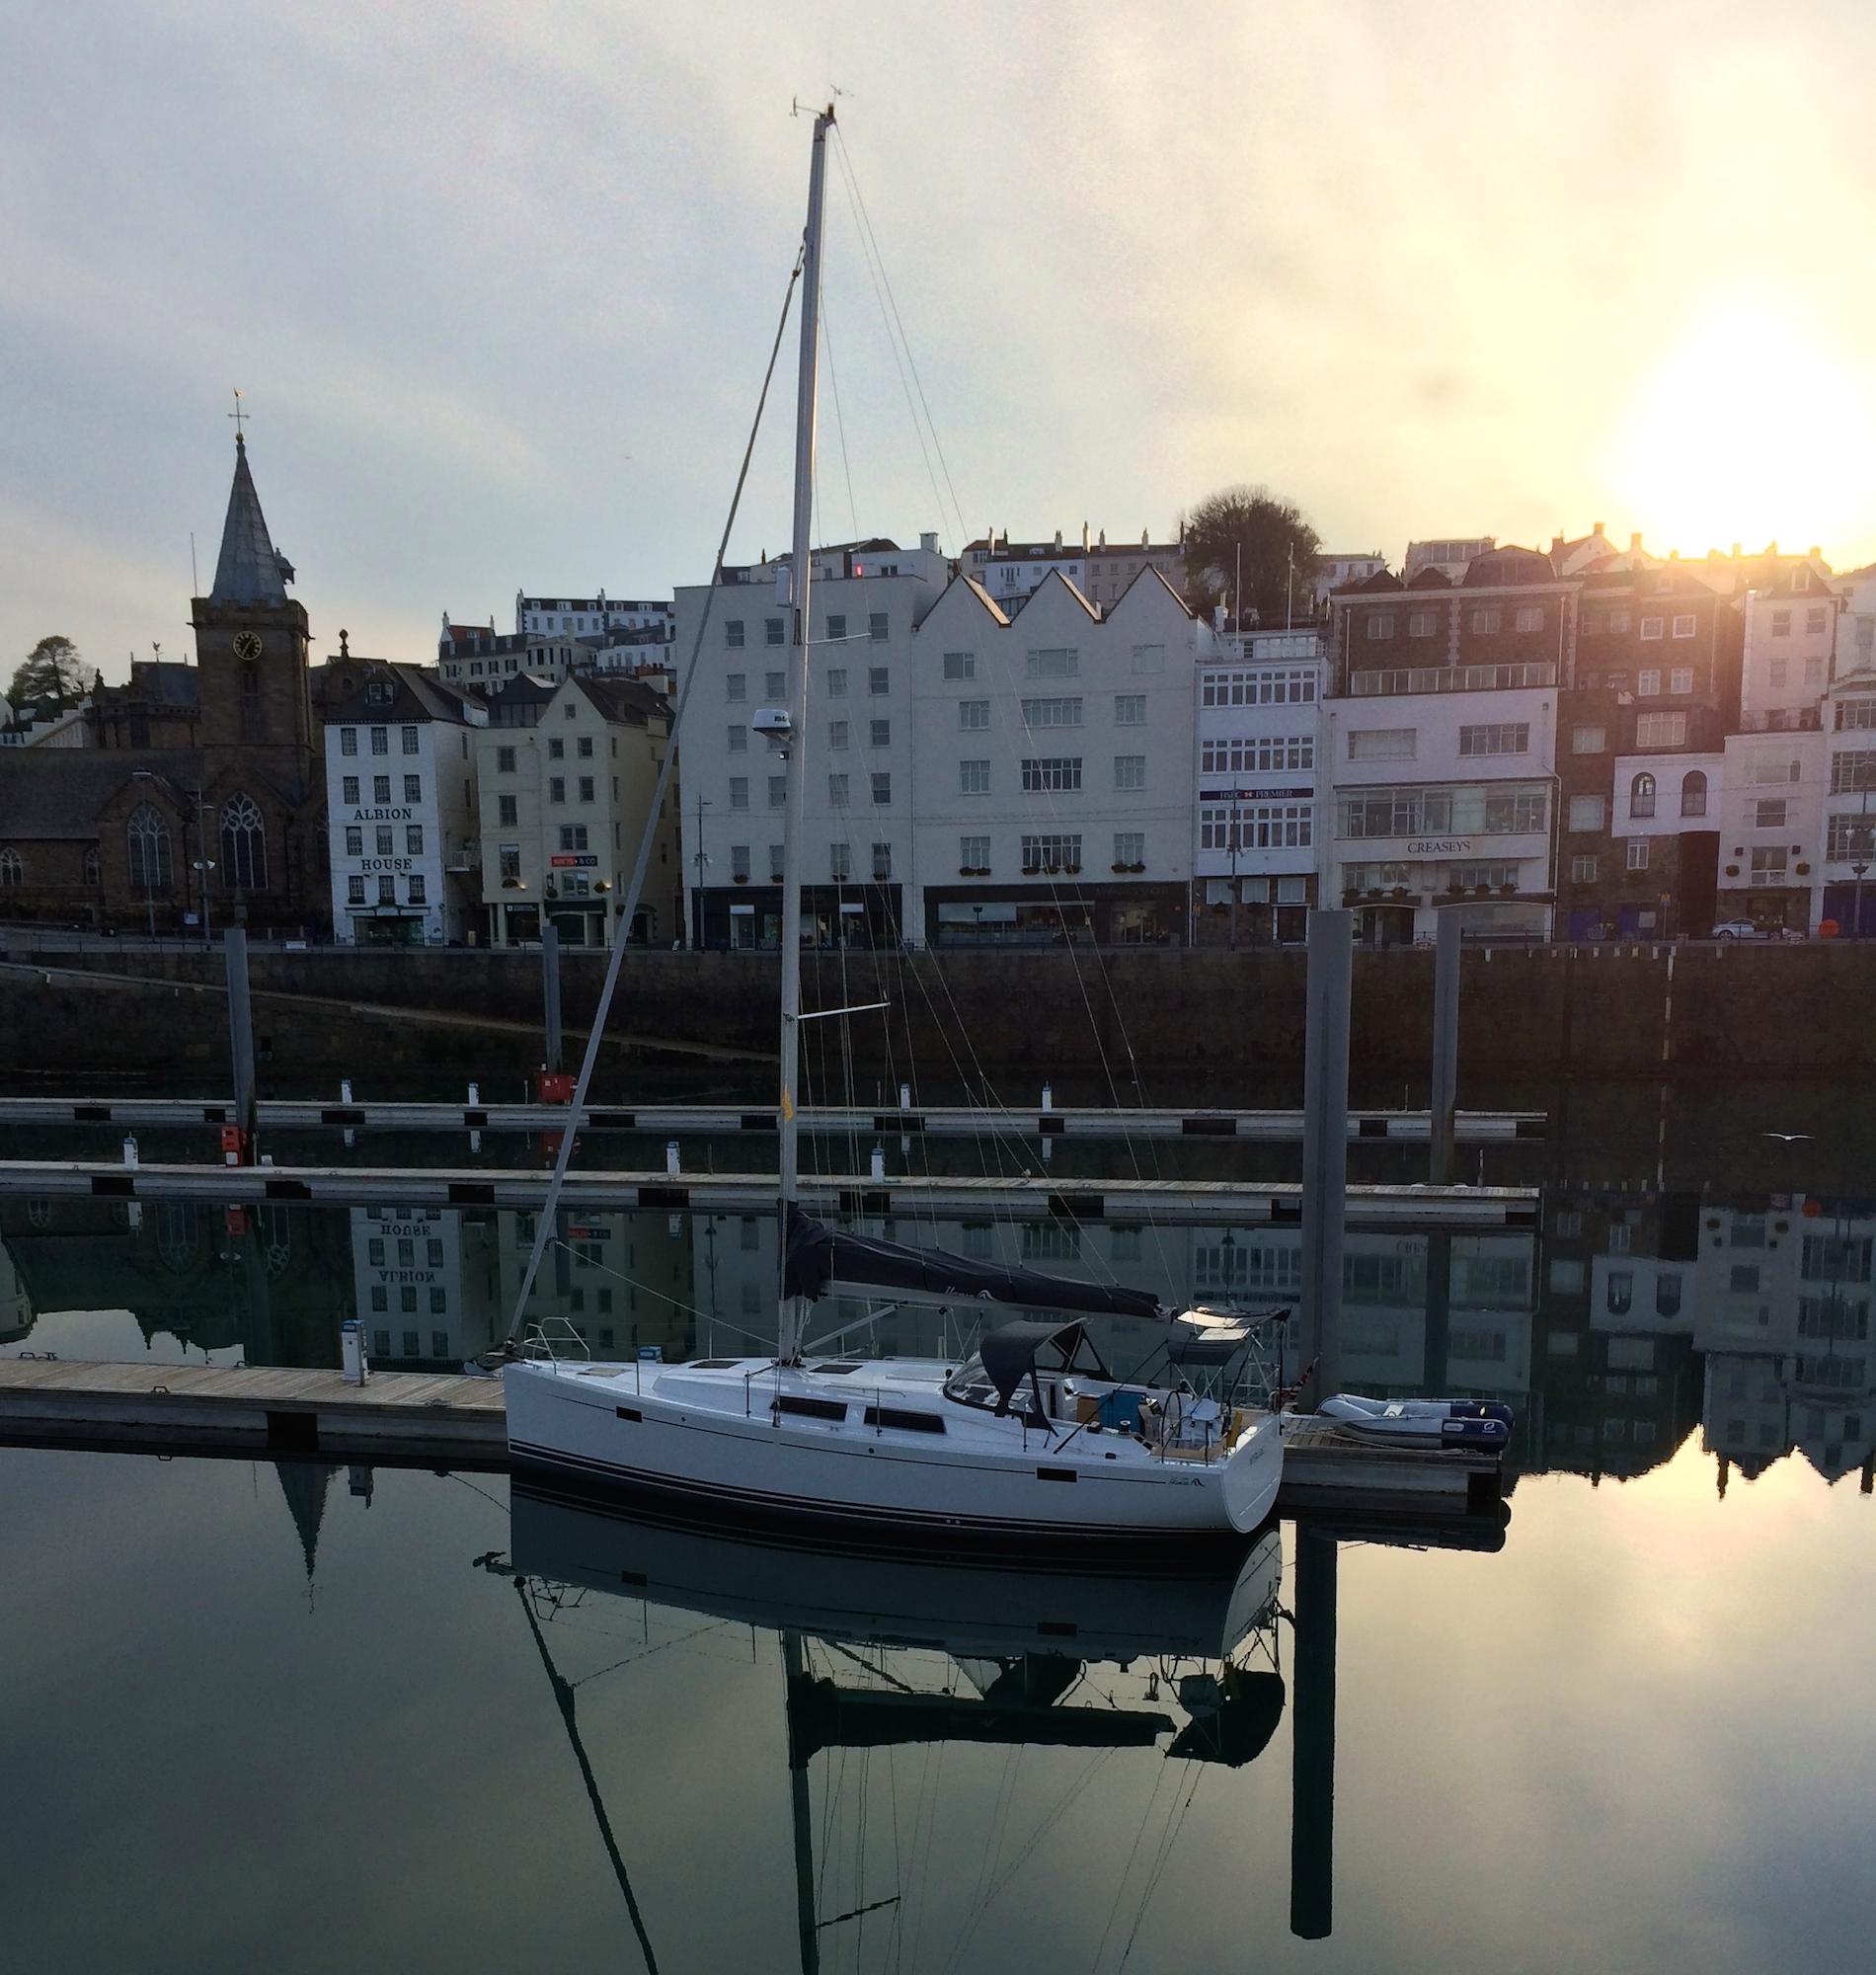 Guernsey 2